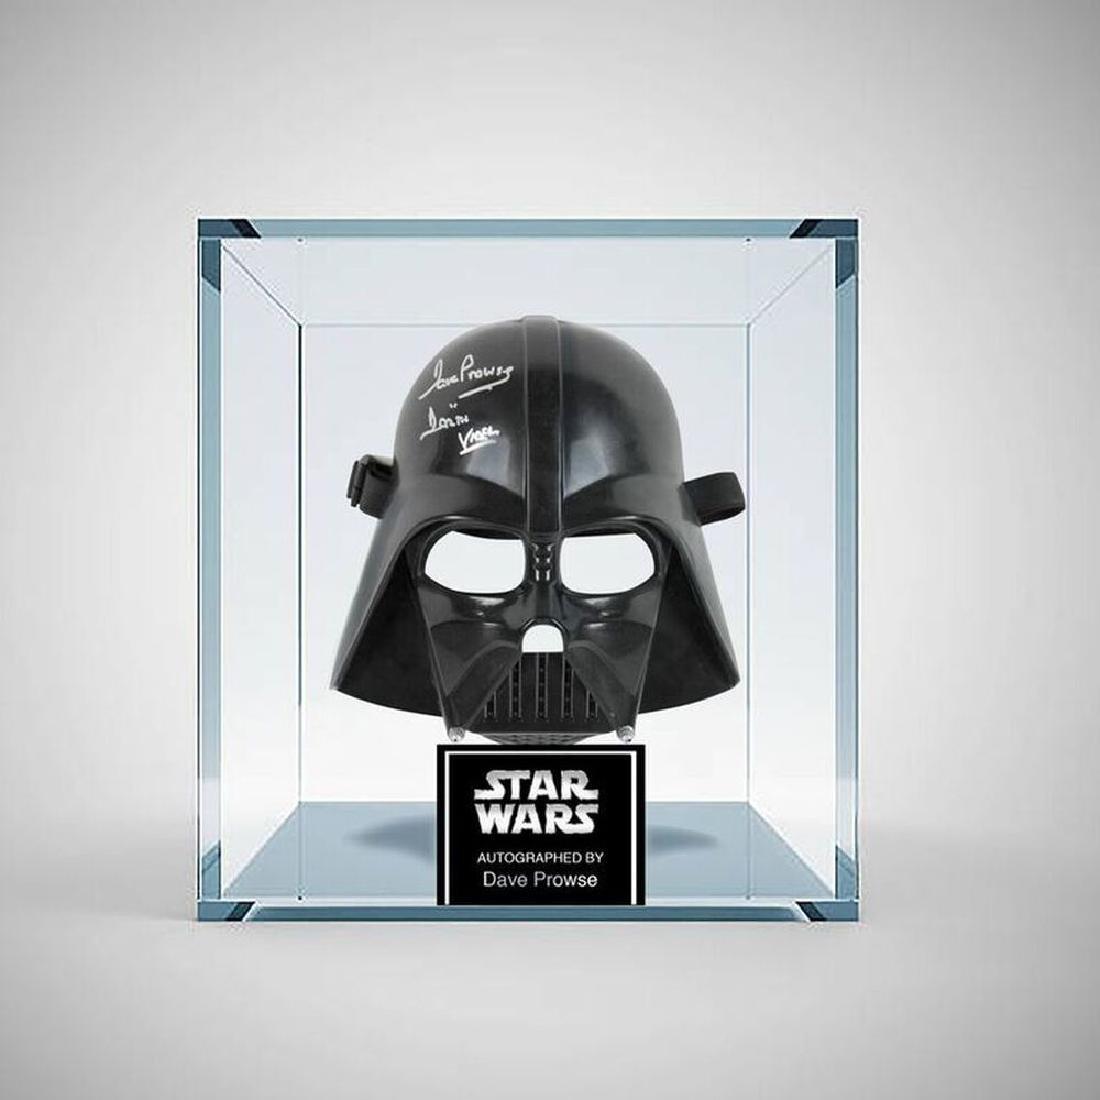 Star Wars' Darth Vader Signed Mask